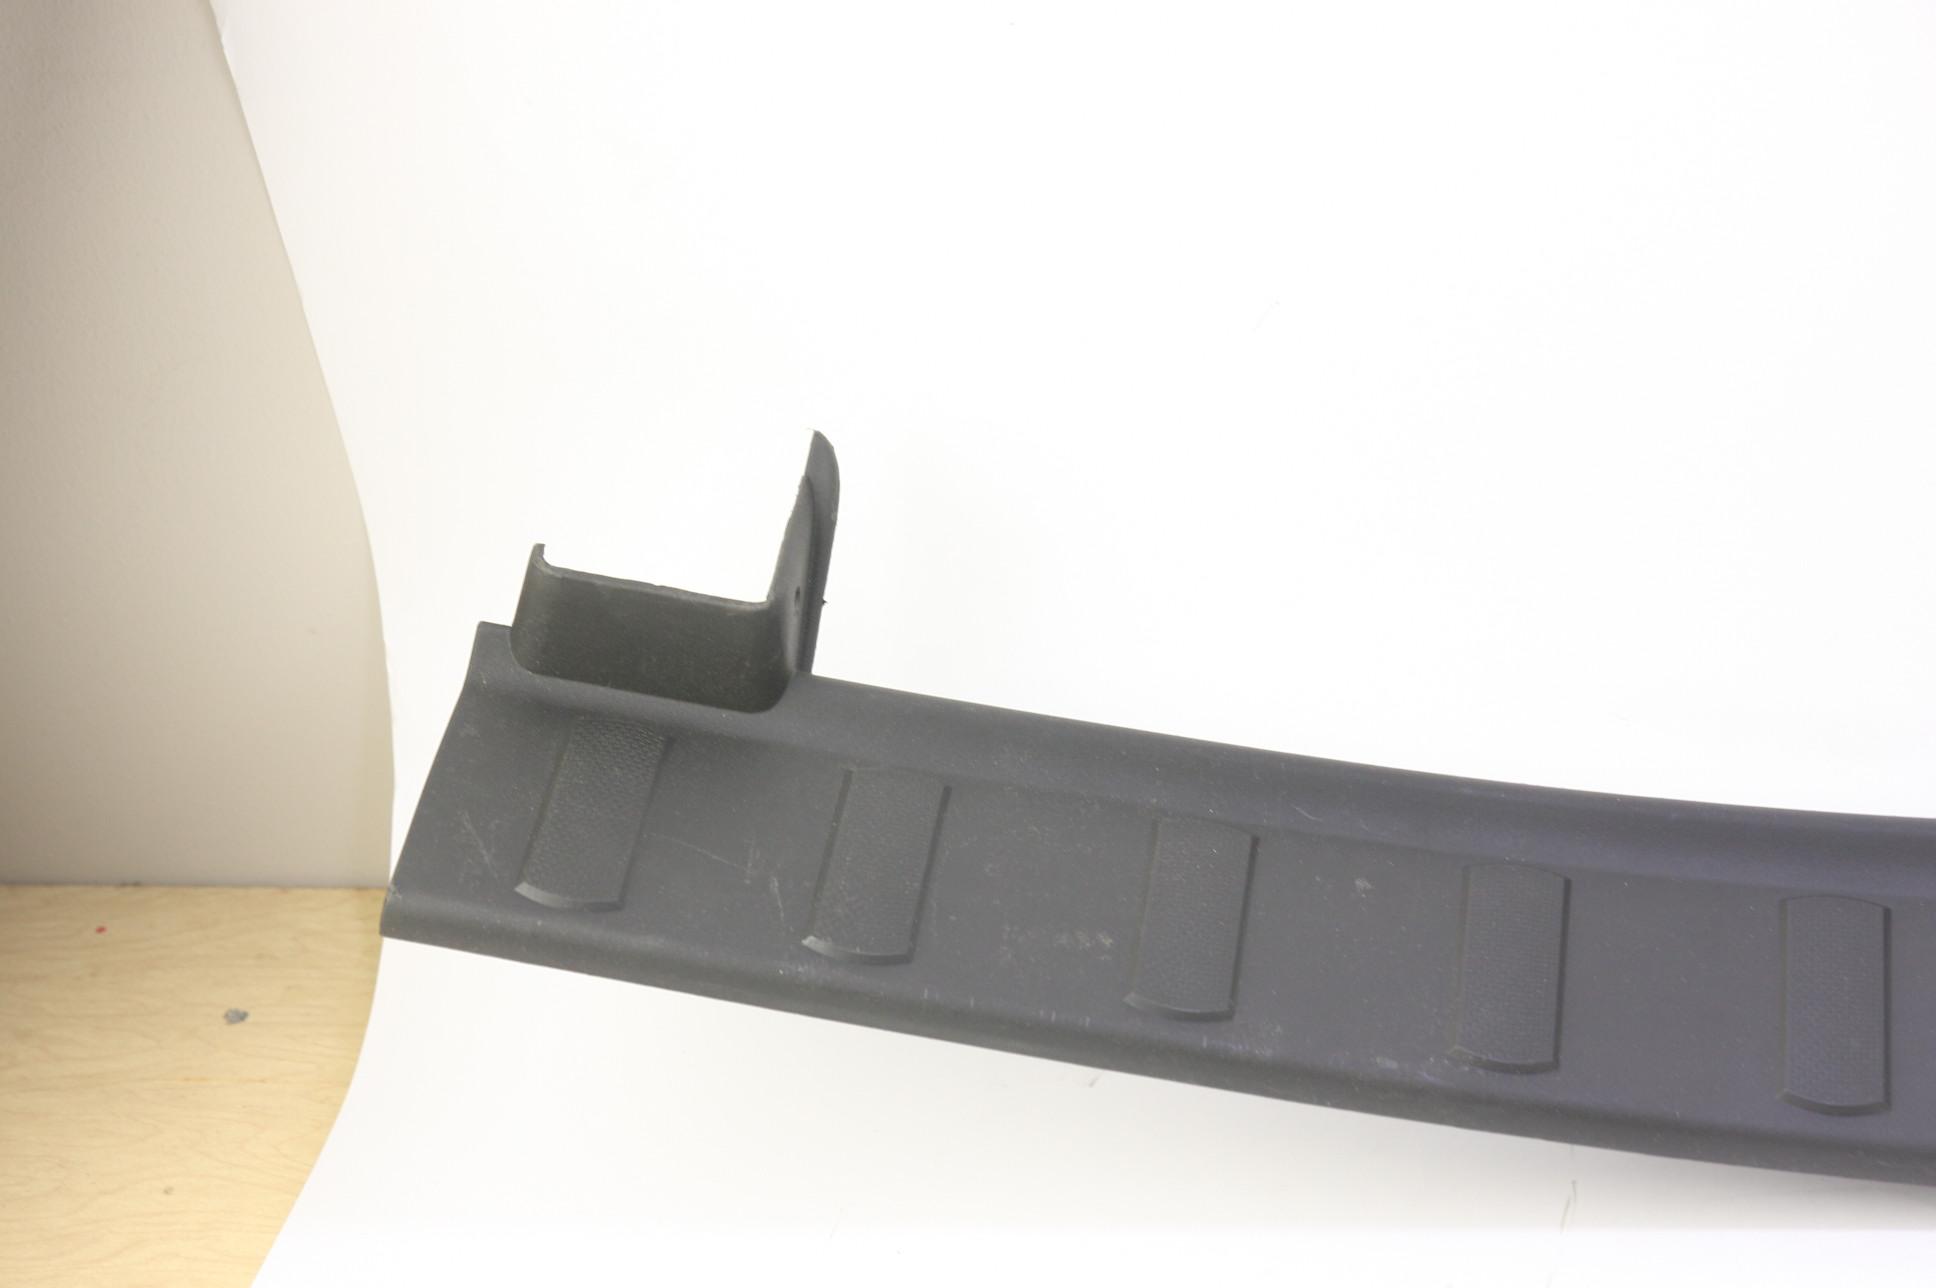 ~ New OEM 9C3Z2813208CA Ford 08-16 F-350 Super Duty Door Sill Scuff Plate RH - image 4